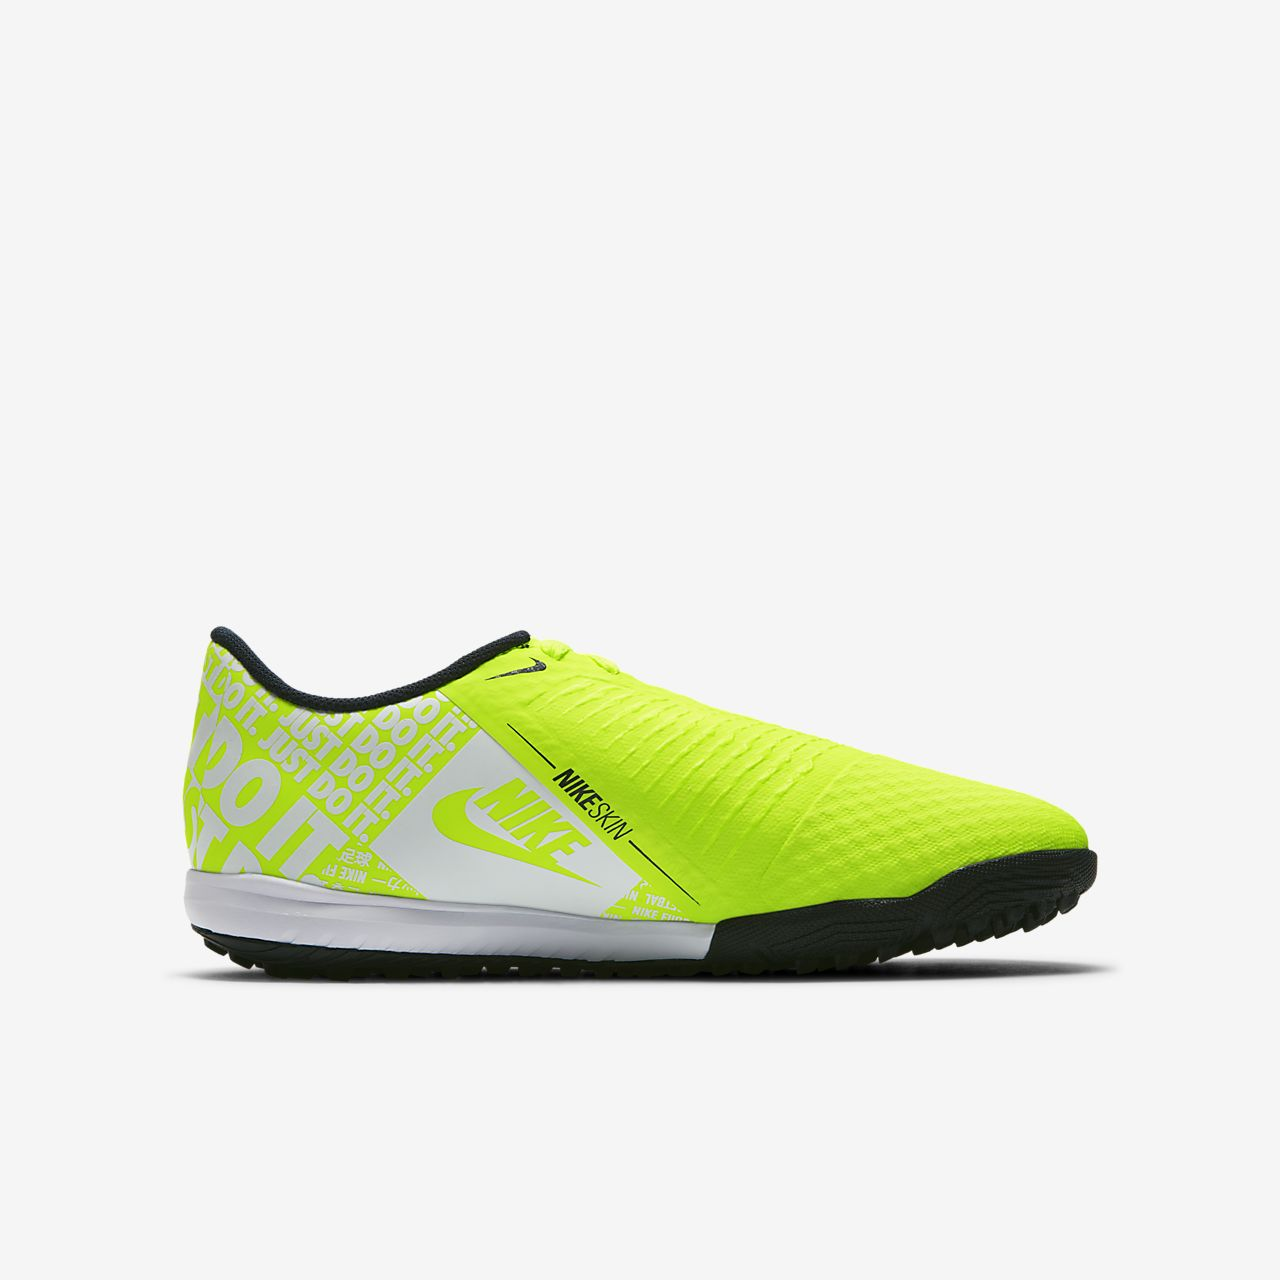 sneakers the best attitude factory outlet Football Enfantenfant Nike Jeune Chaussure Pour Tf Surface ...